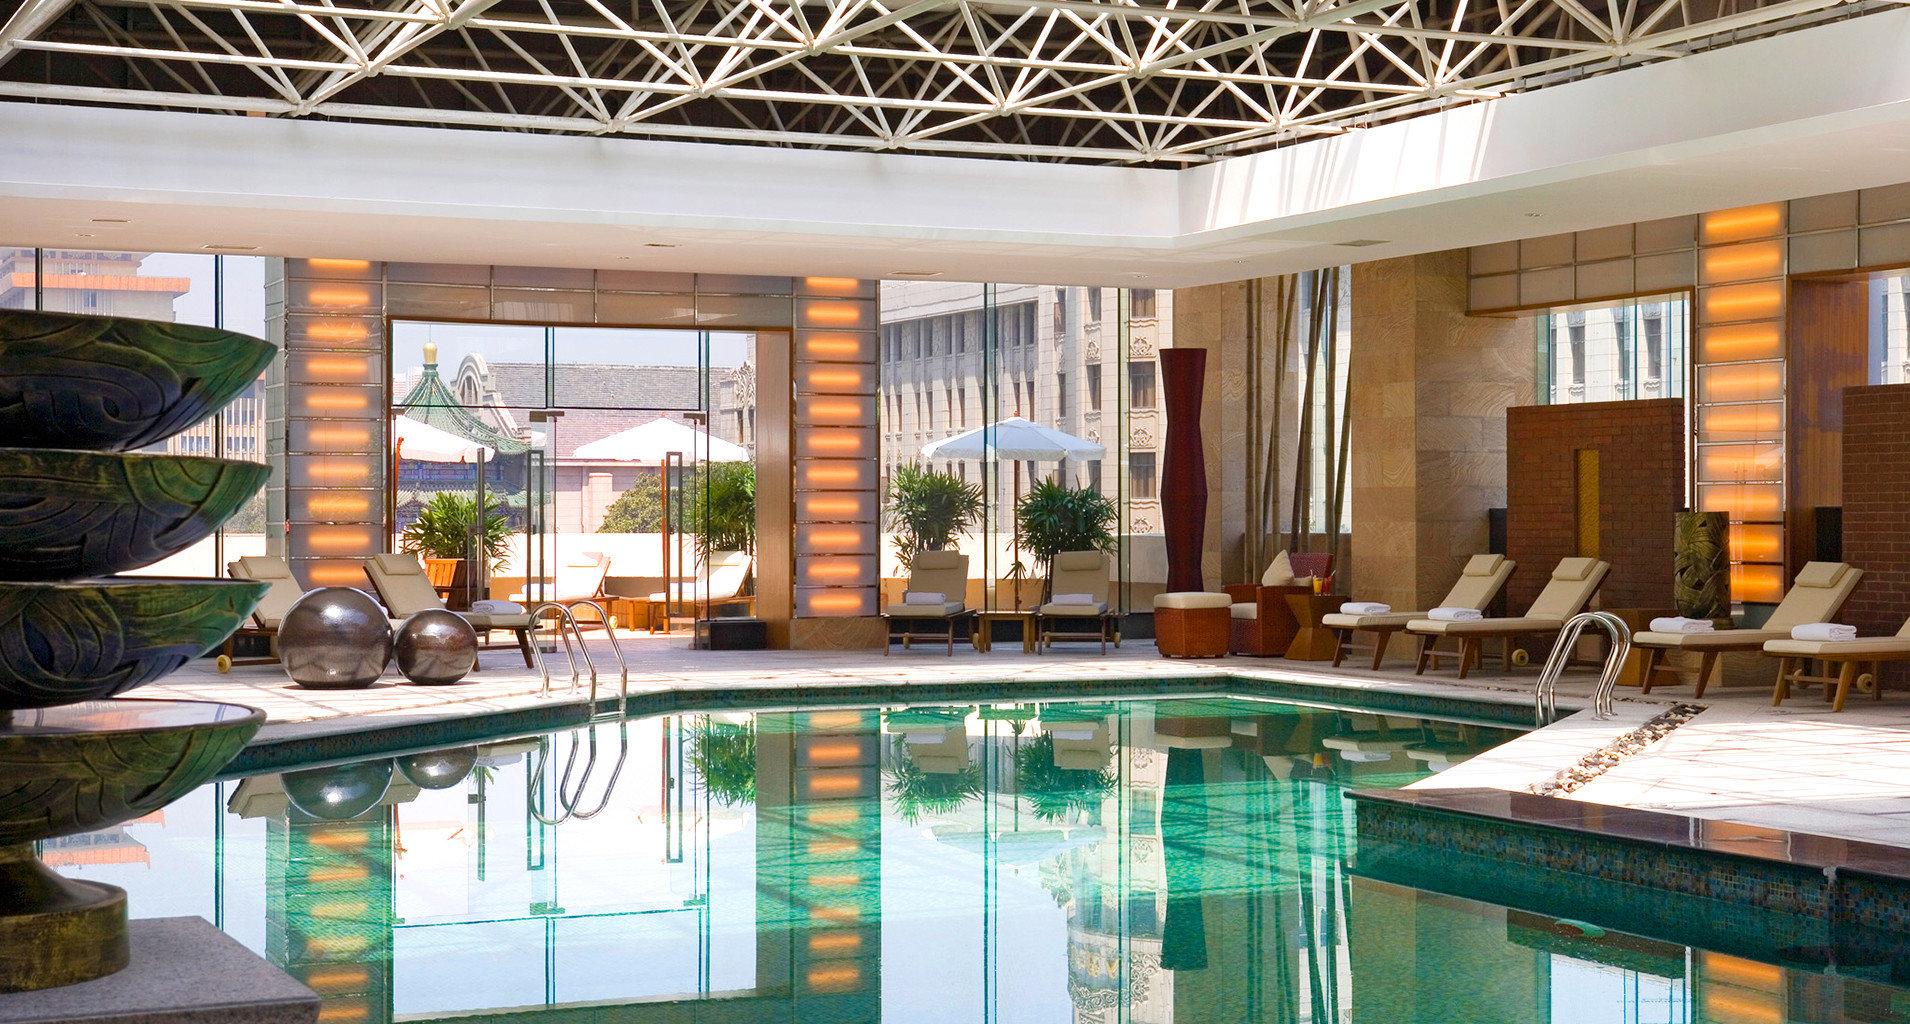 Play Pool Resort swimming pool property condominium building home Villa backyard mansion Island